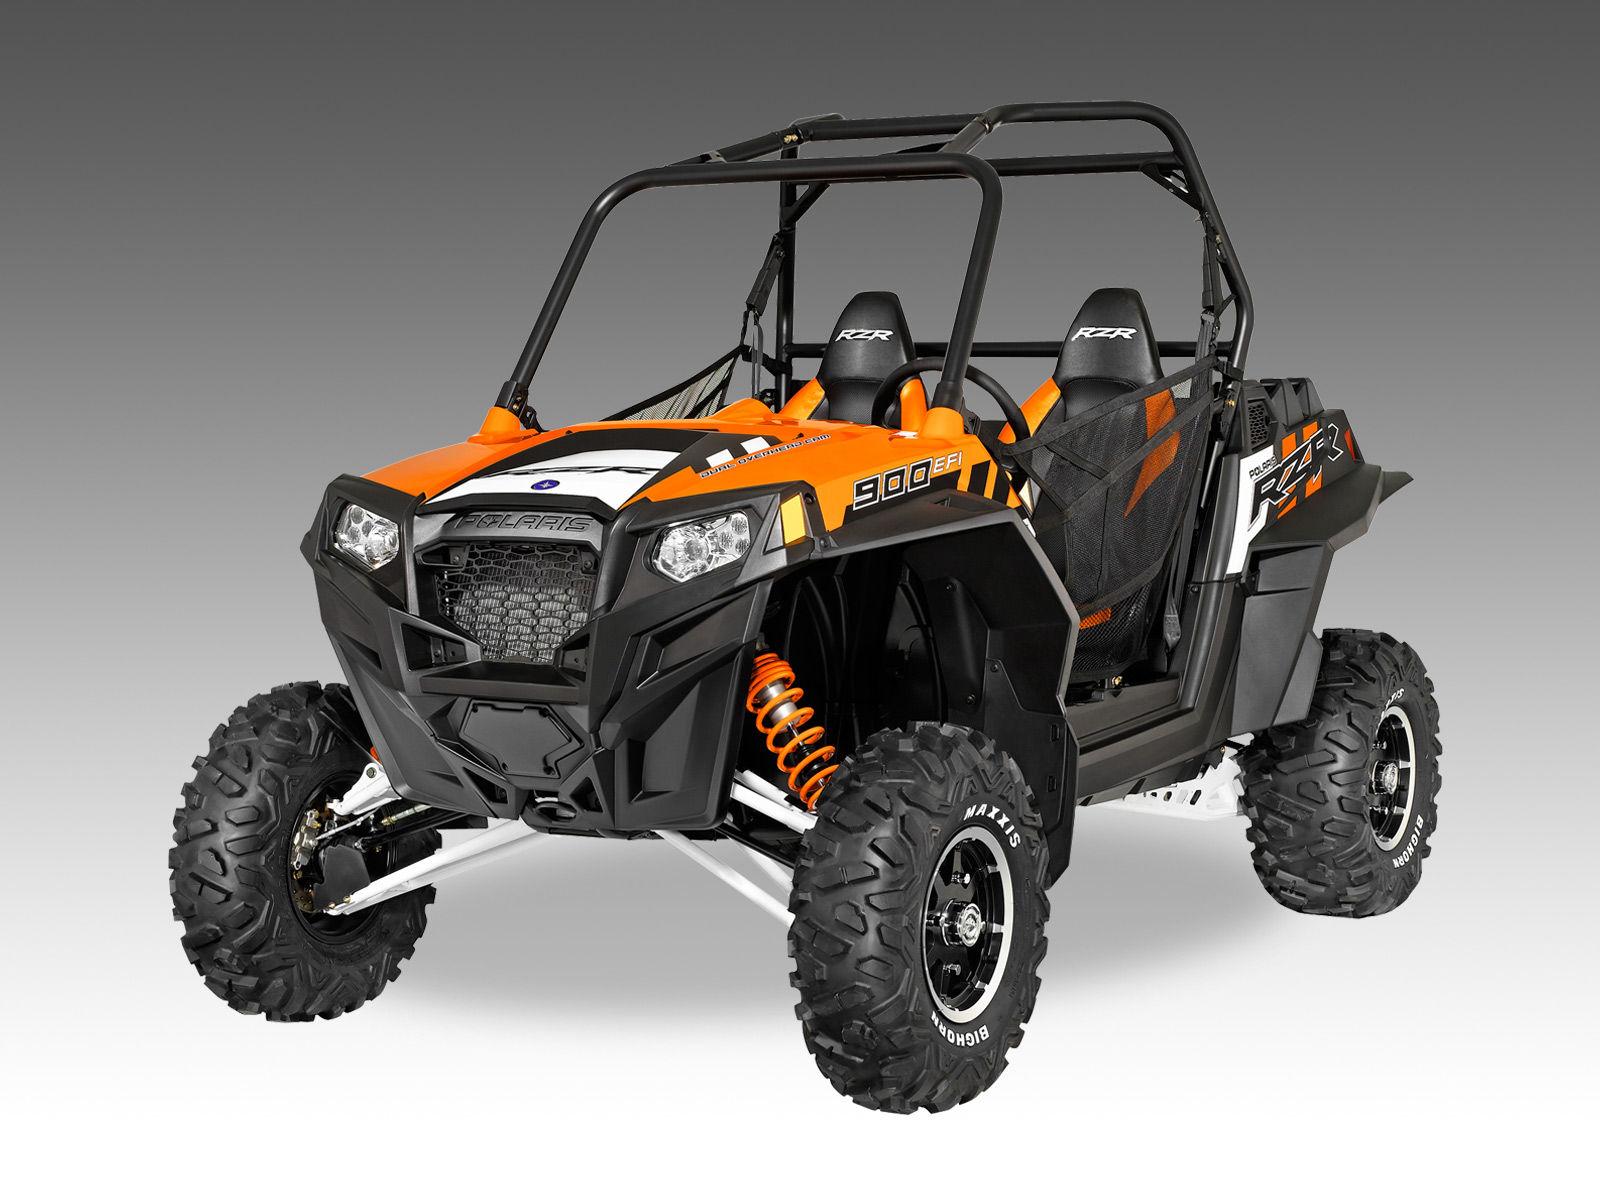 2014-rzr-900-orange-white_3q